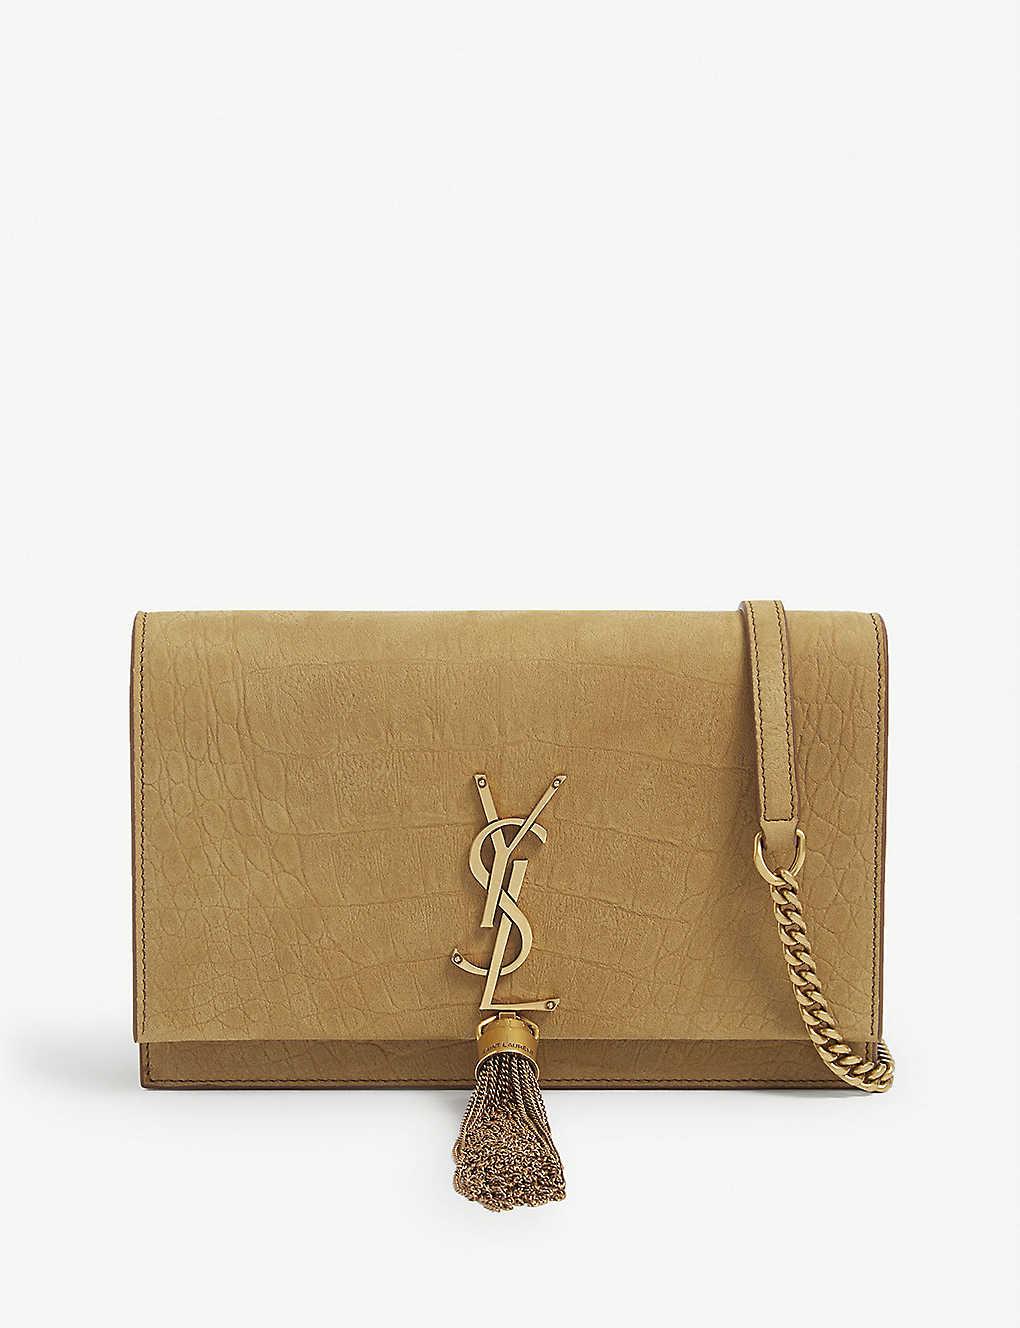 SAINT LAURENT: Kate tassel embellished wallet on chain